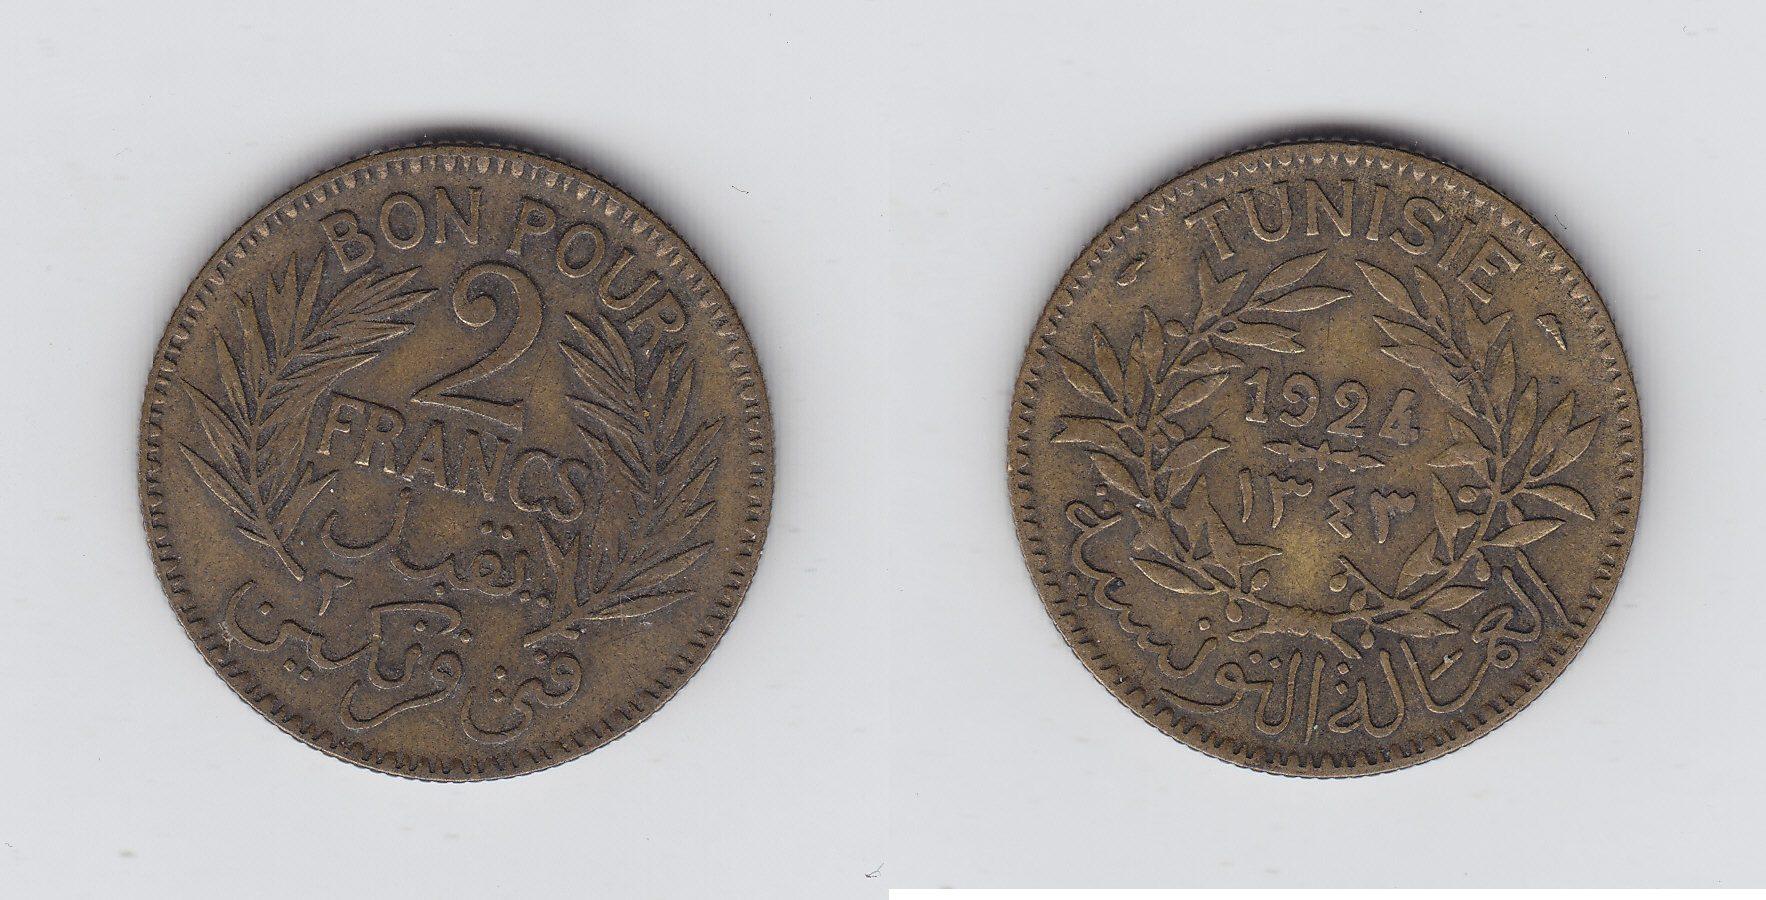 Tunesien 2 Francs 1924 ss